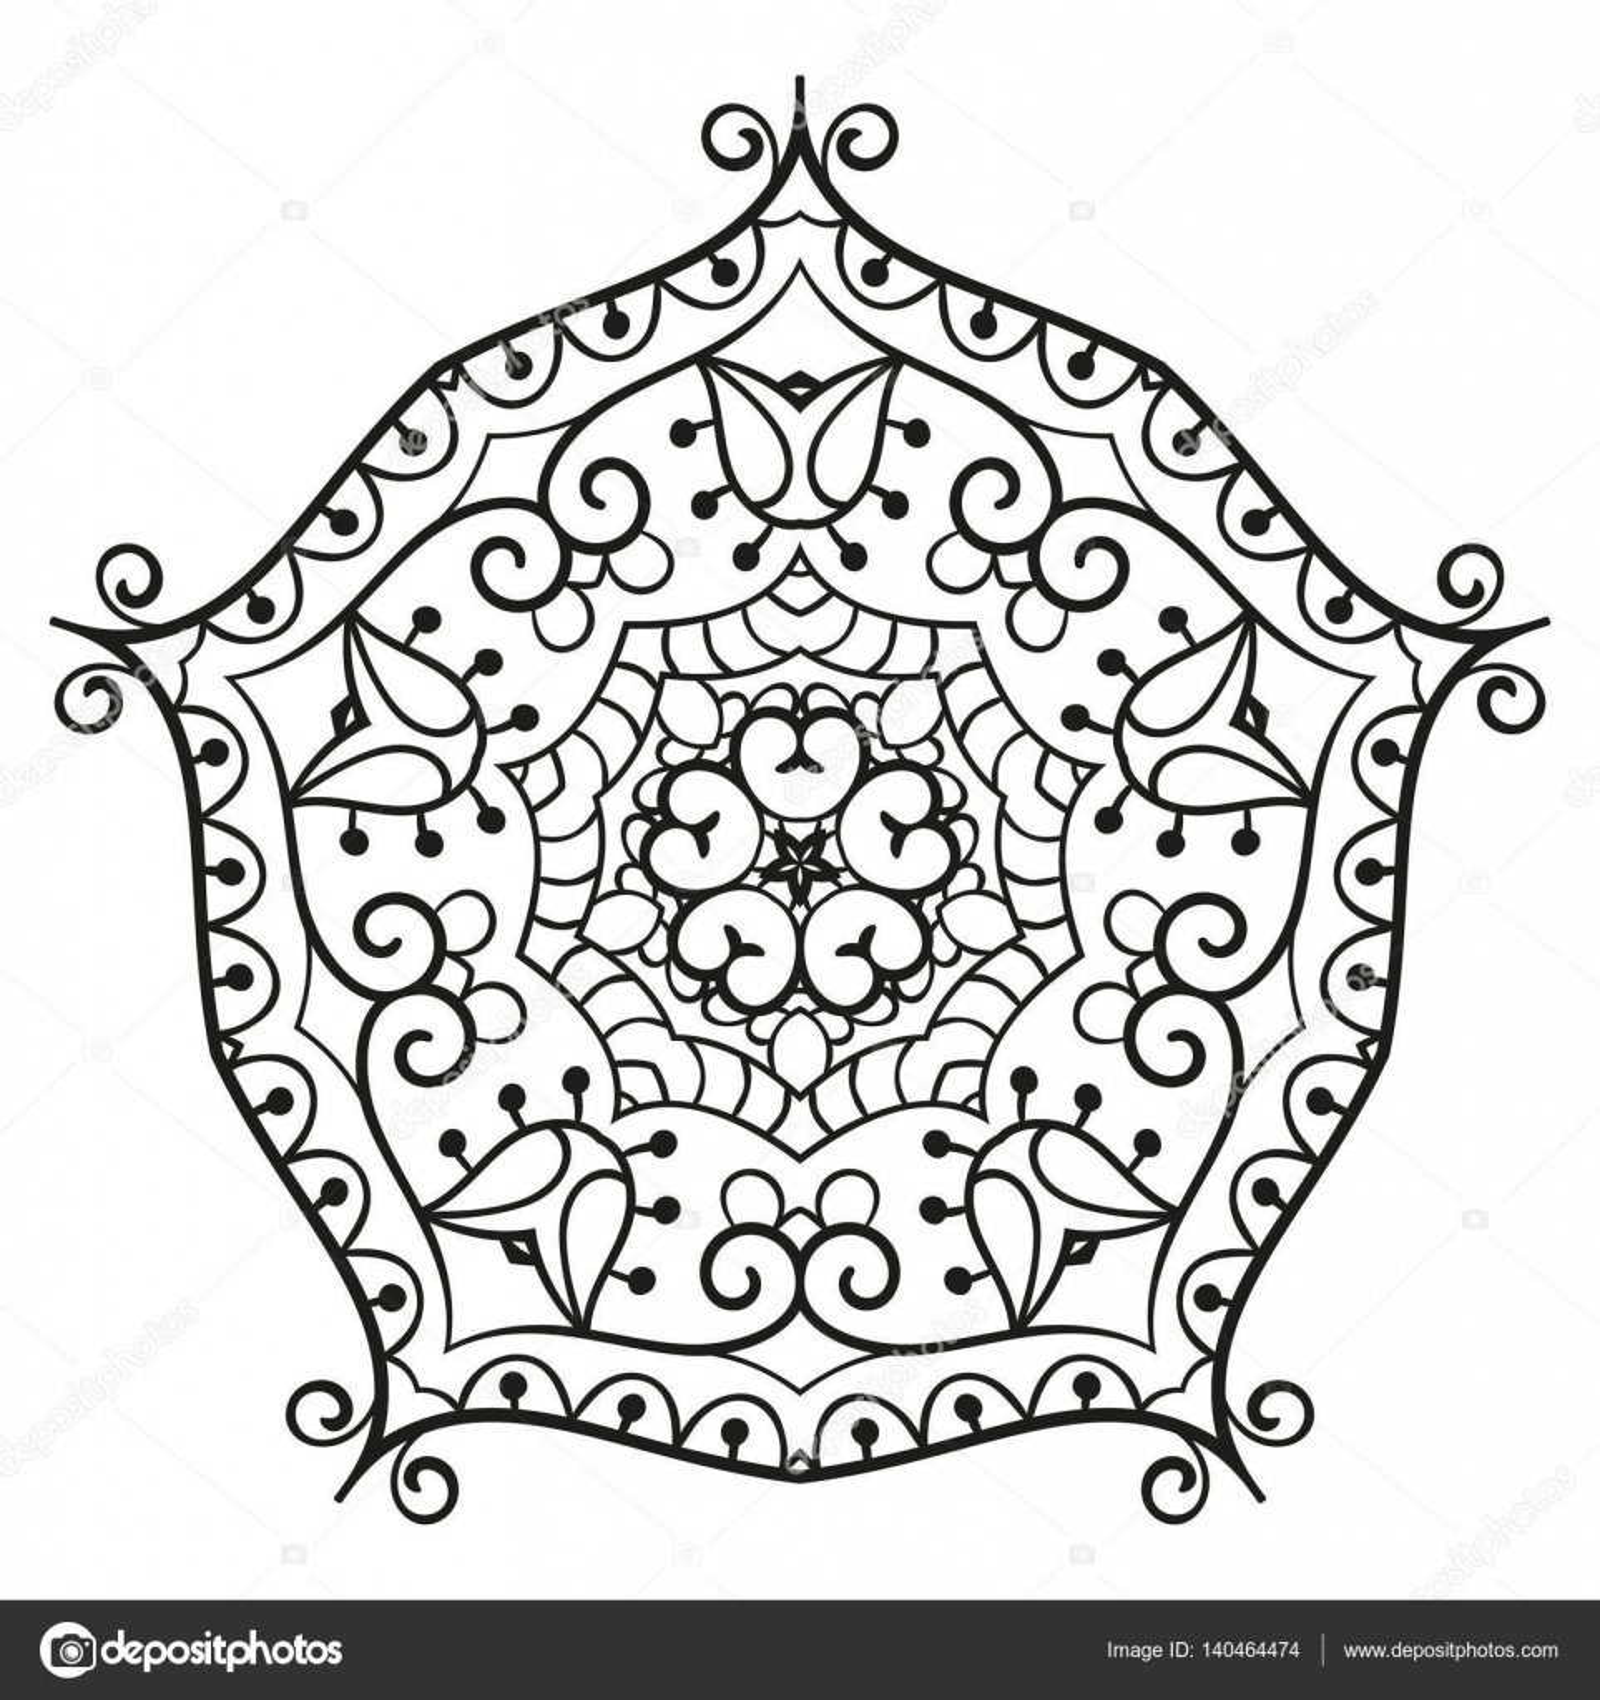 Mandala para colorear libro — Vector de stock © OlgaTropinina #140464474